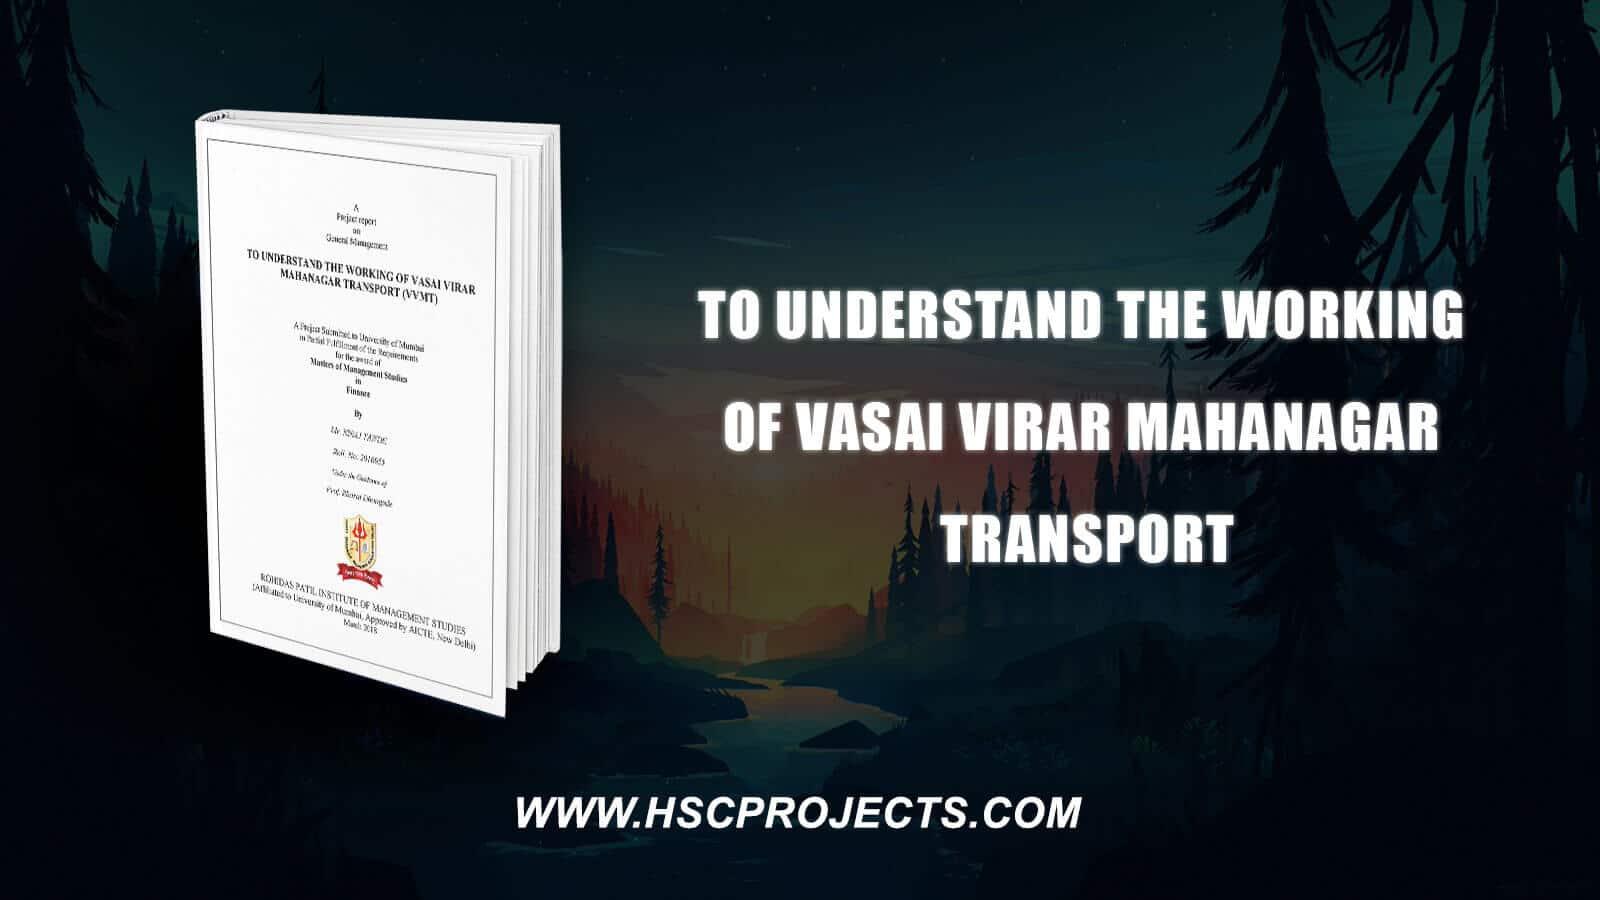 To Understand The Working Of Vasai Virar Mahanagar Transport